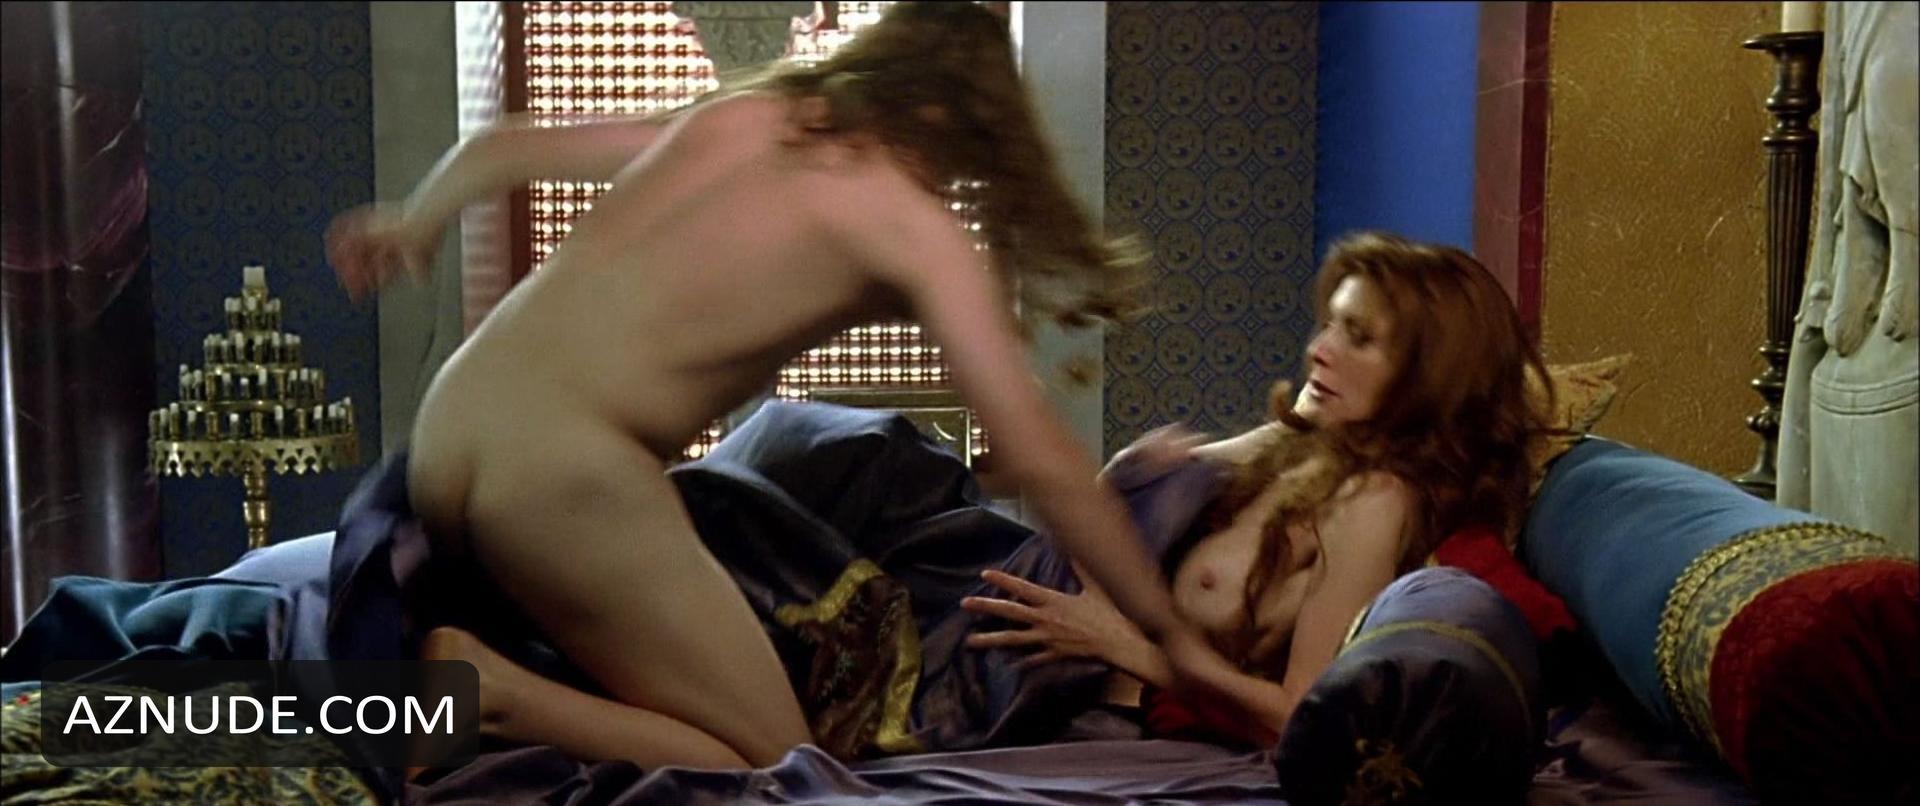 Jane Asher Nude - Aznude-4273